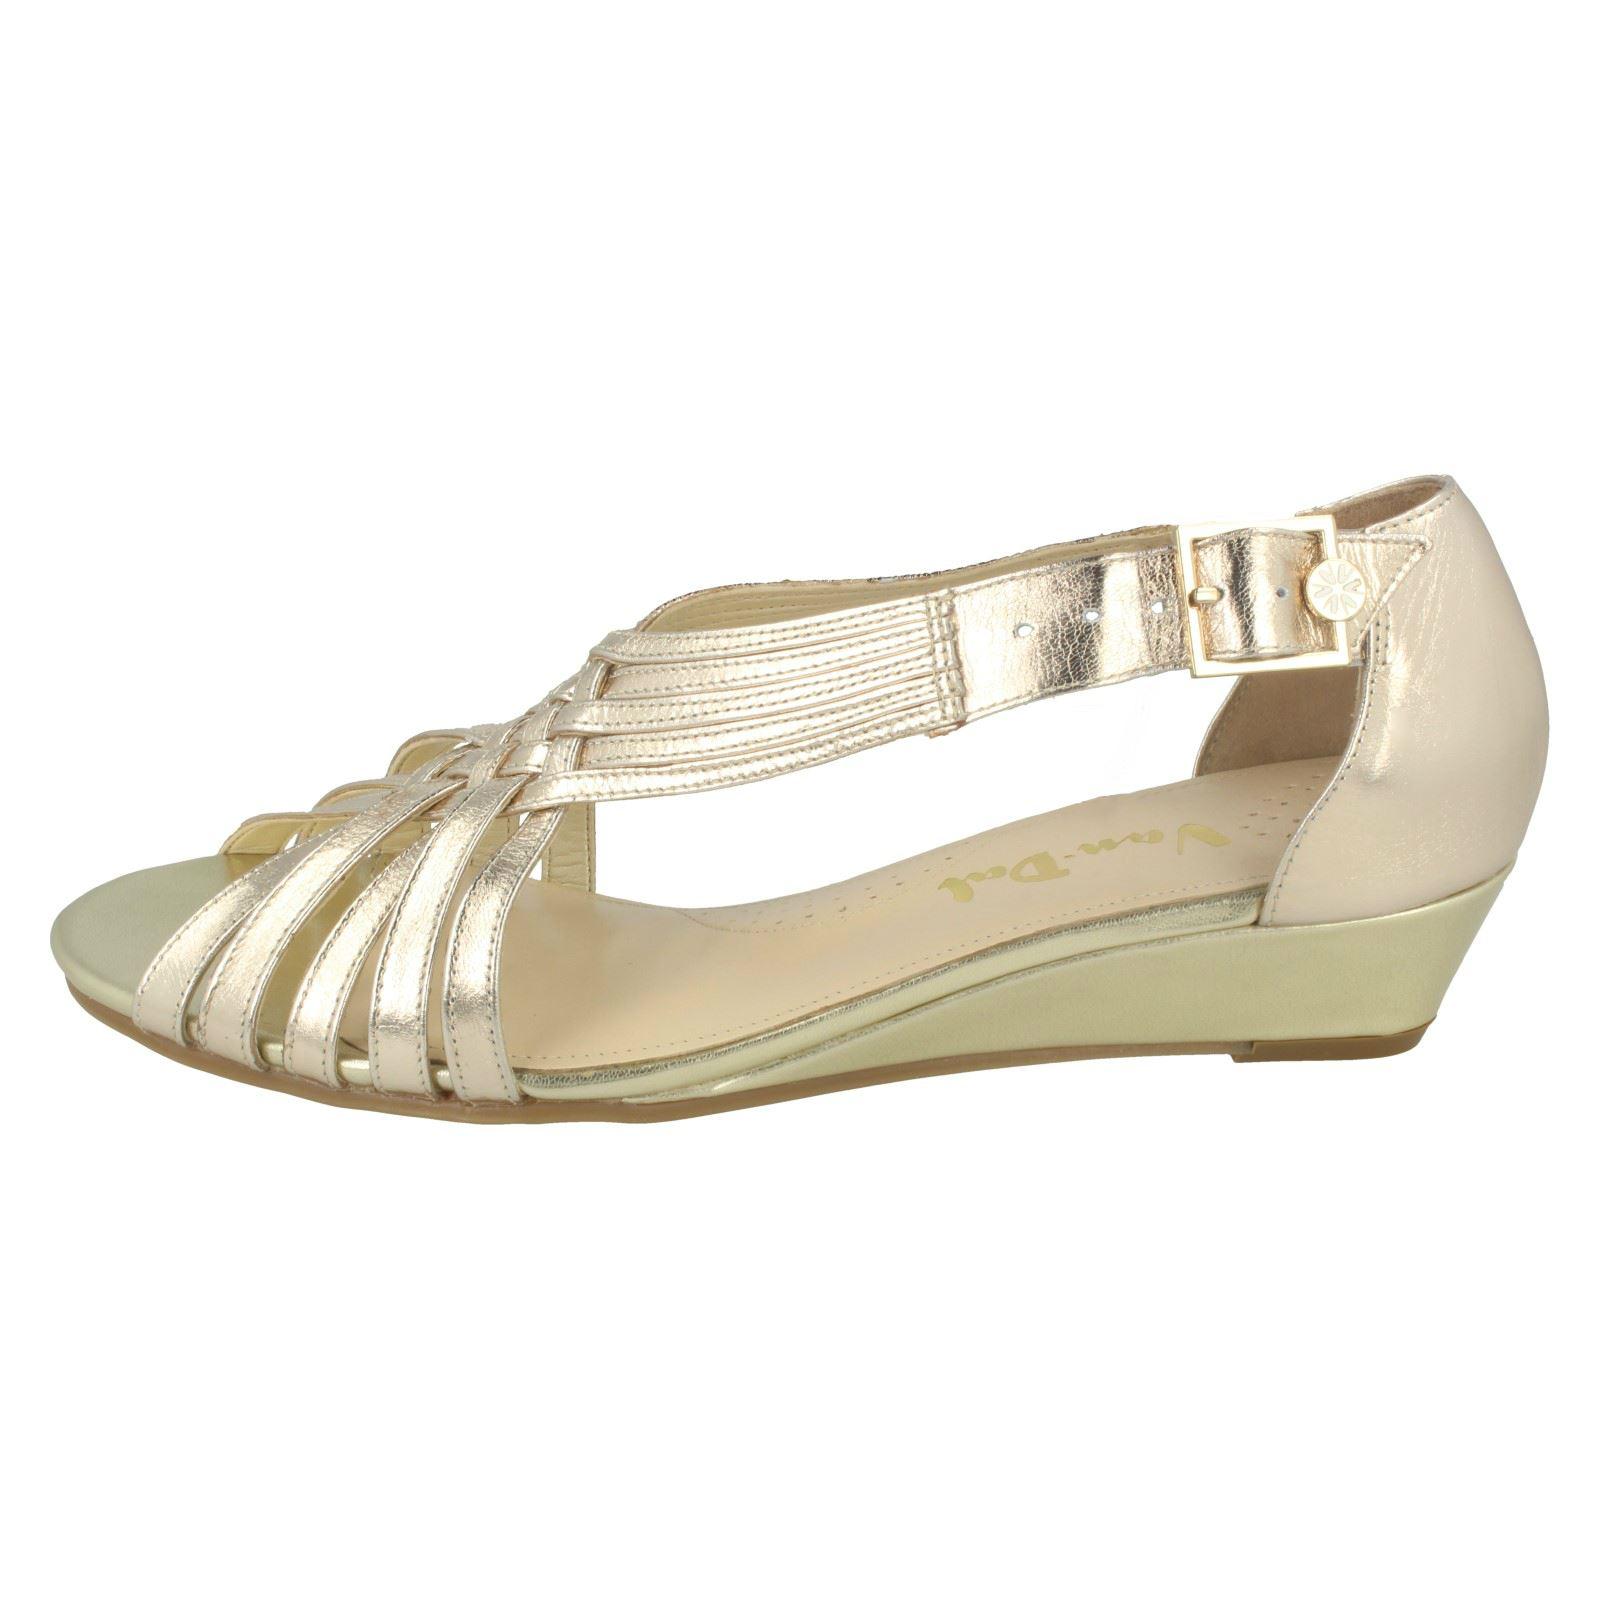 Ladies-Van-Dal-Wedge-Strappy-Sandals-Lucie thumbnail 22